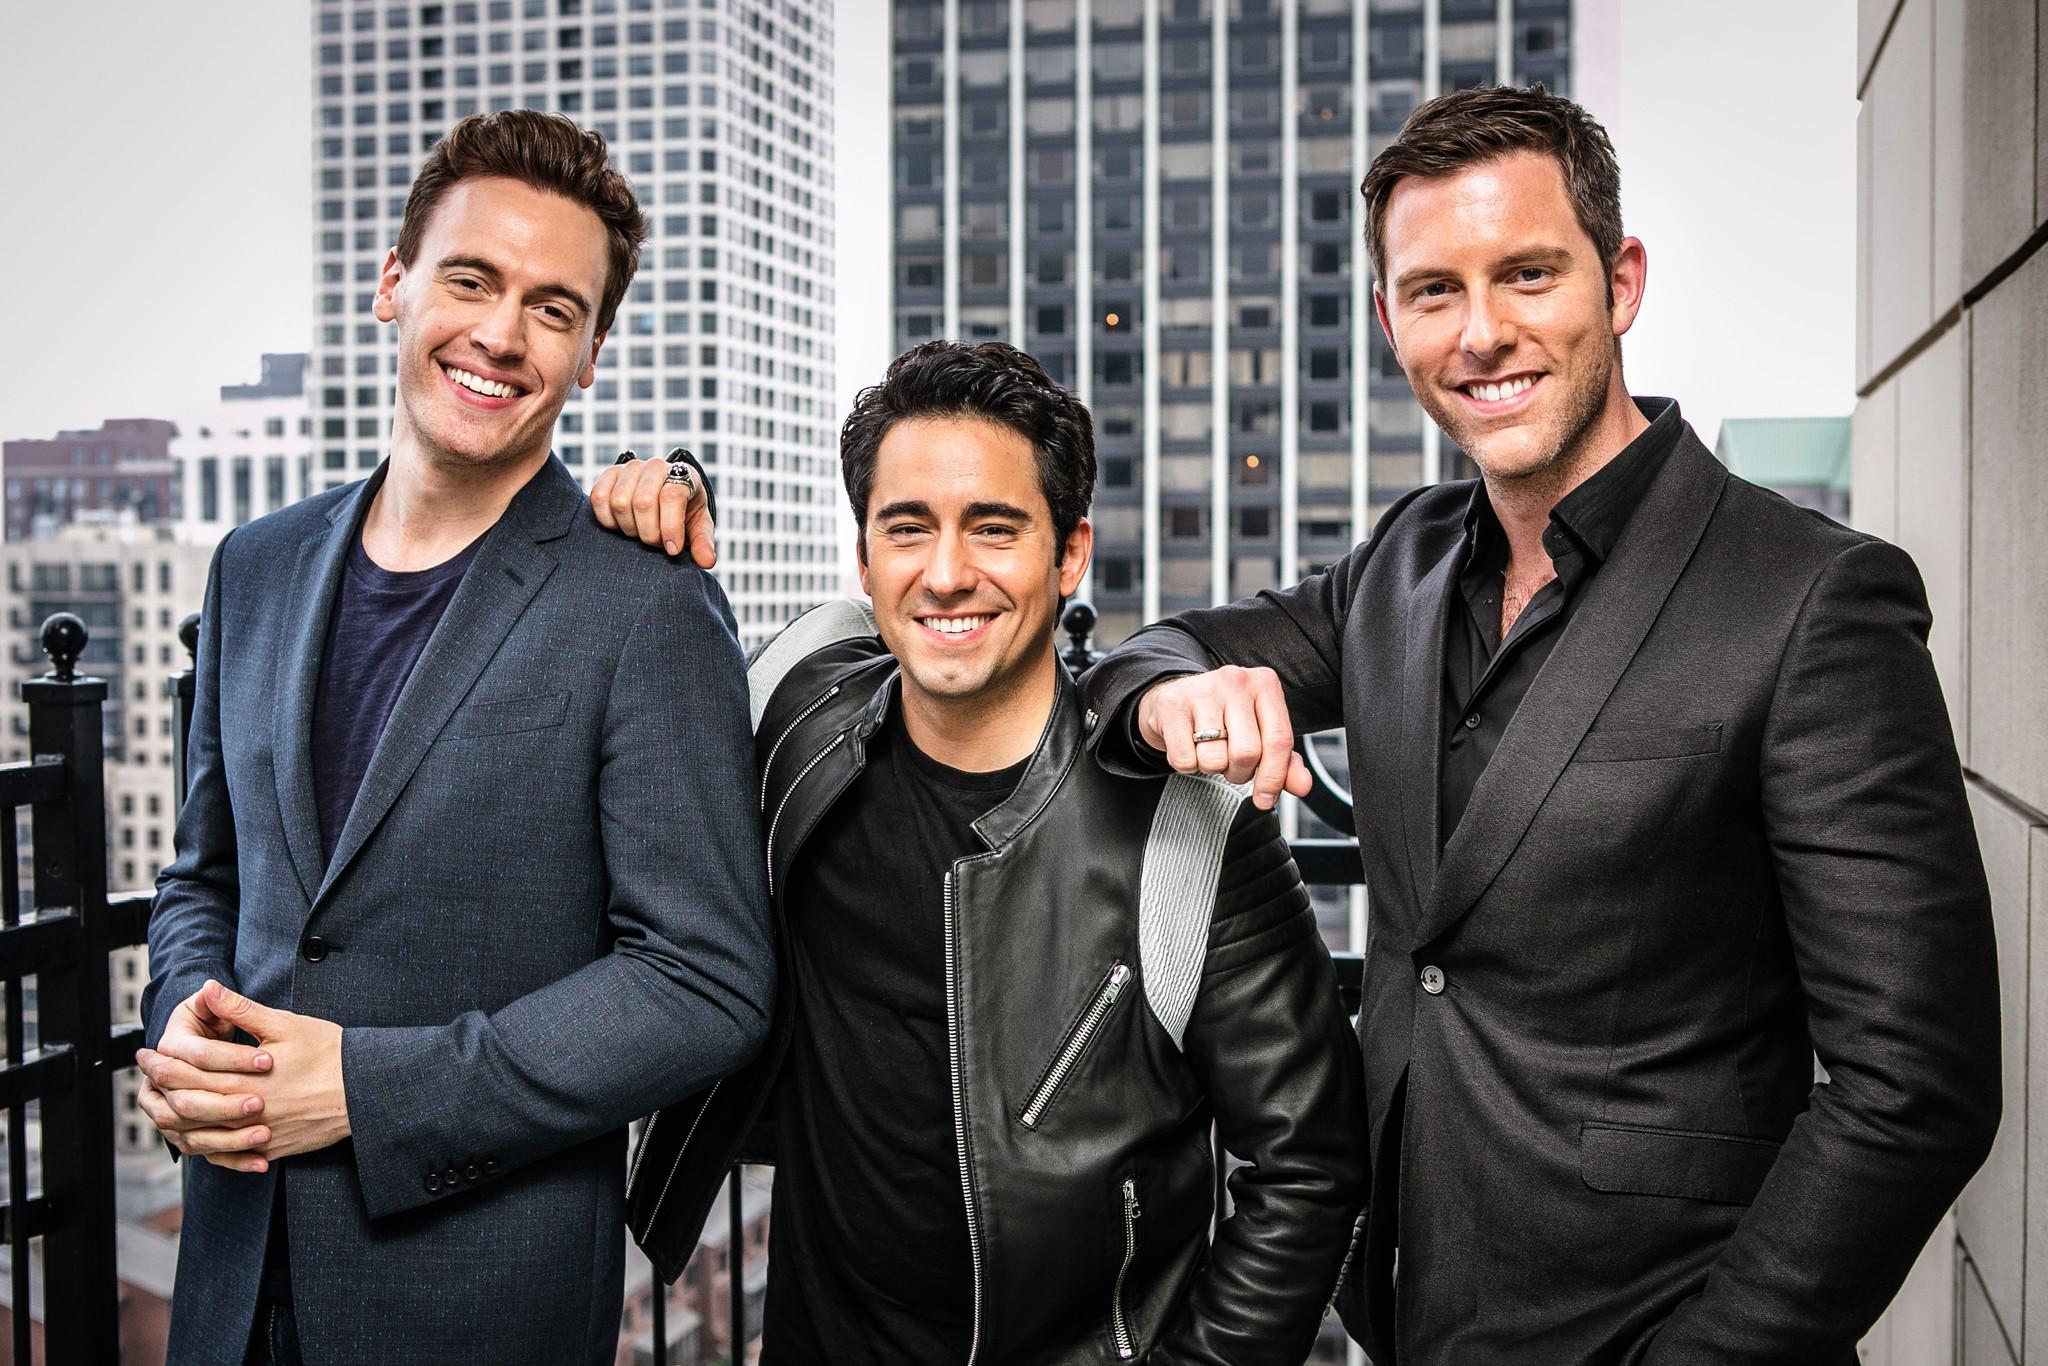 Jersey Boys  film press tour in Chicago